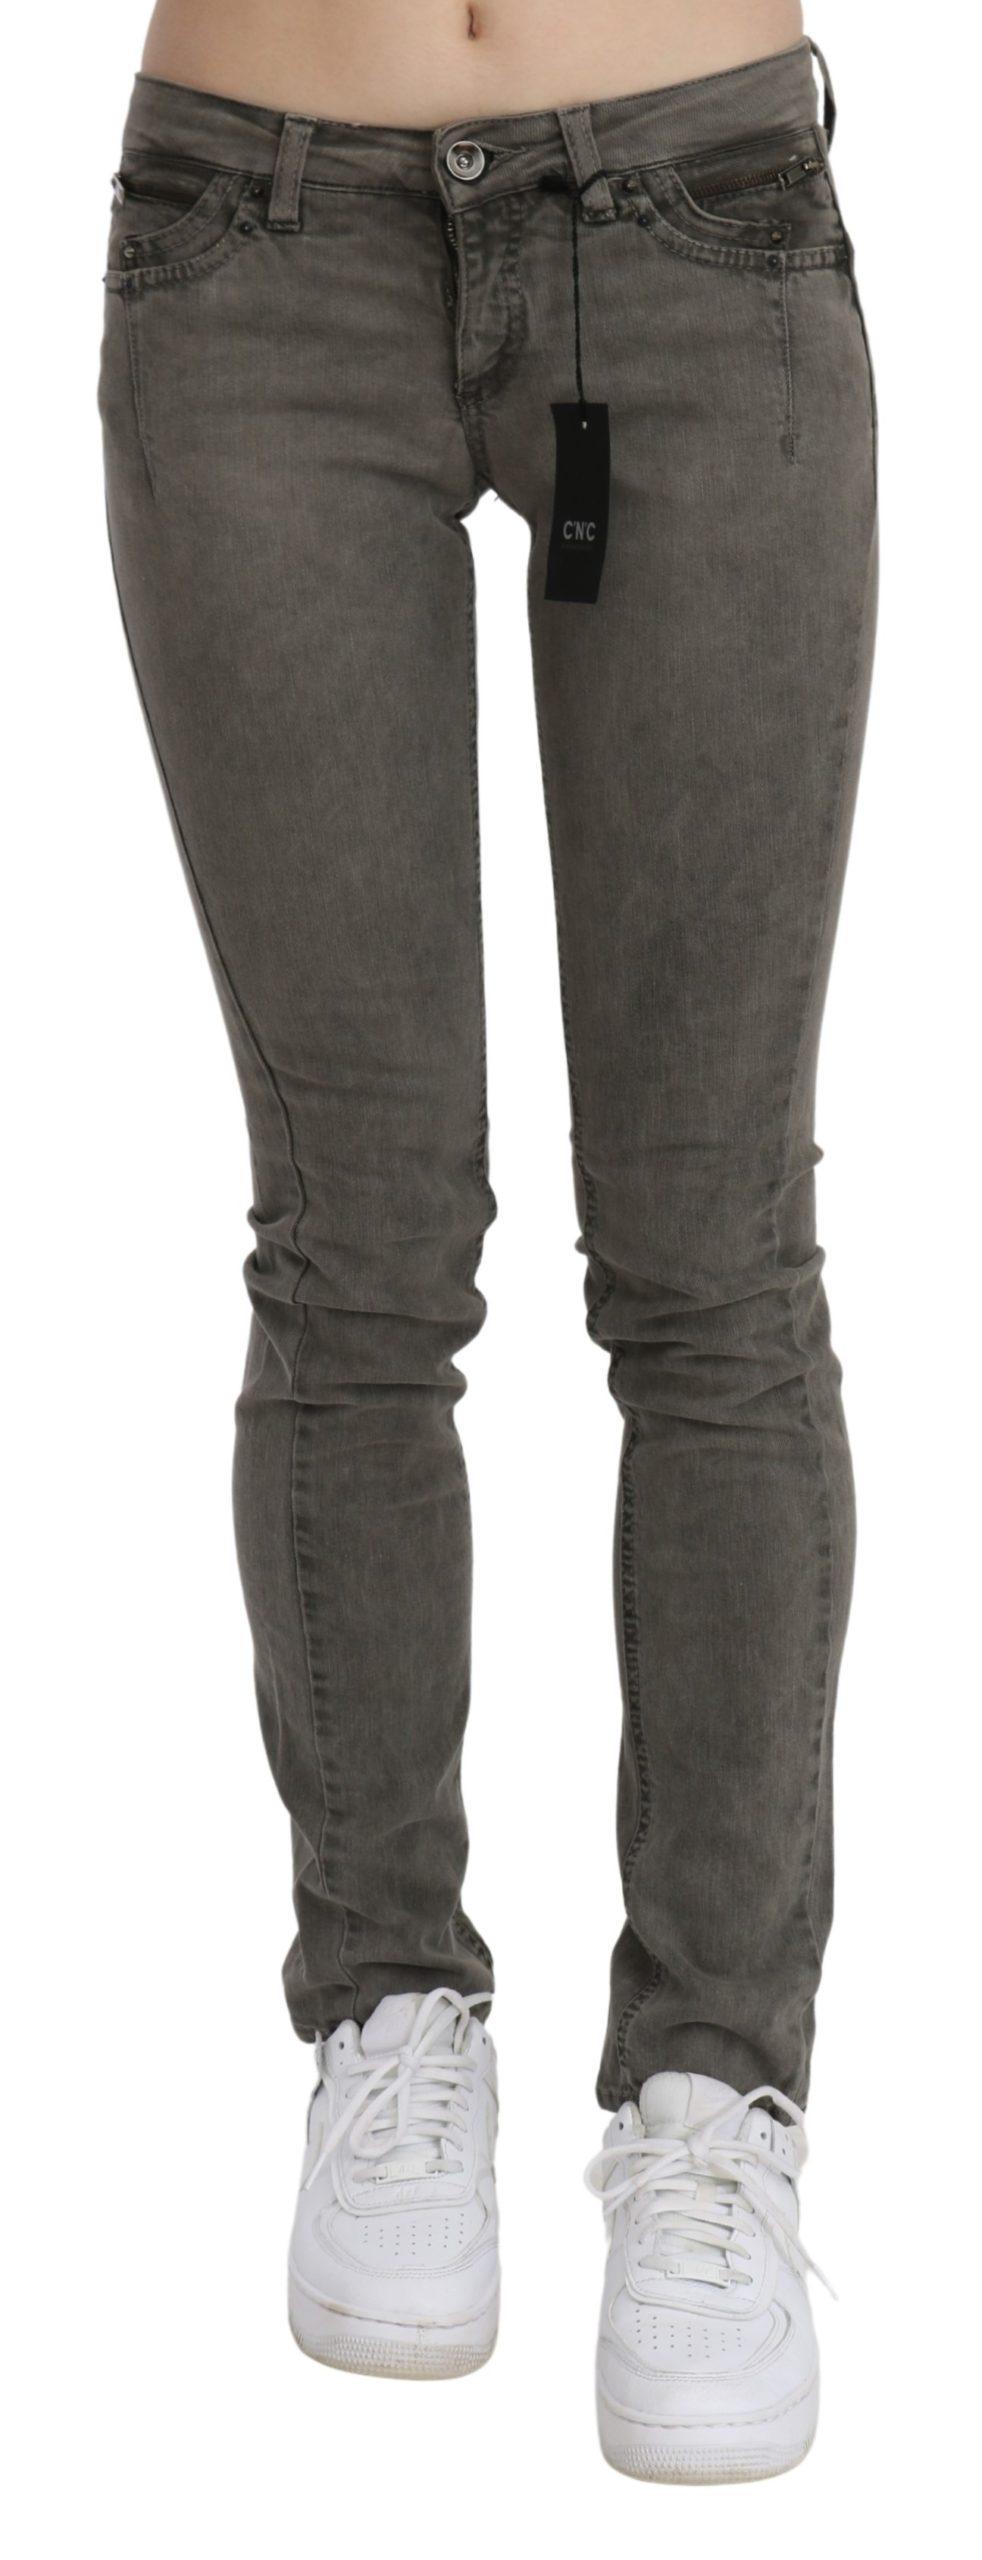 Costume National Women's Low Waist Skinny Denim Cotton Jeans Gray PAN70726 - W26